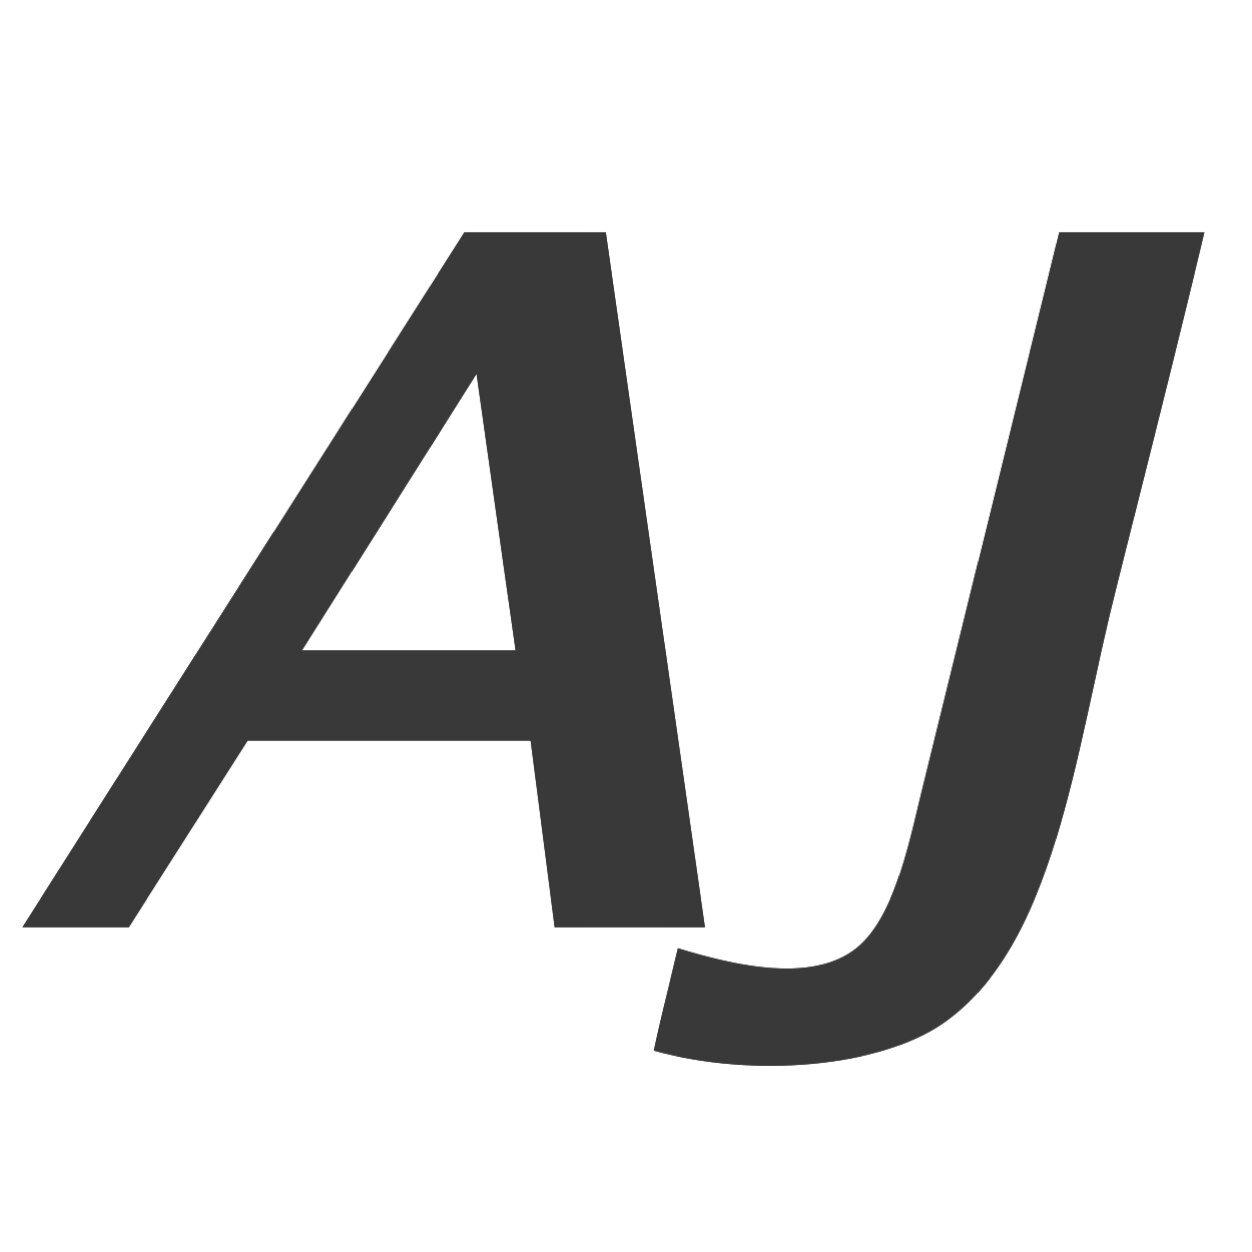 AJ Acevedo